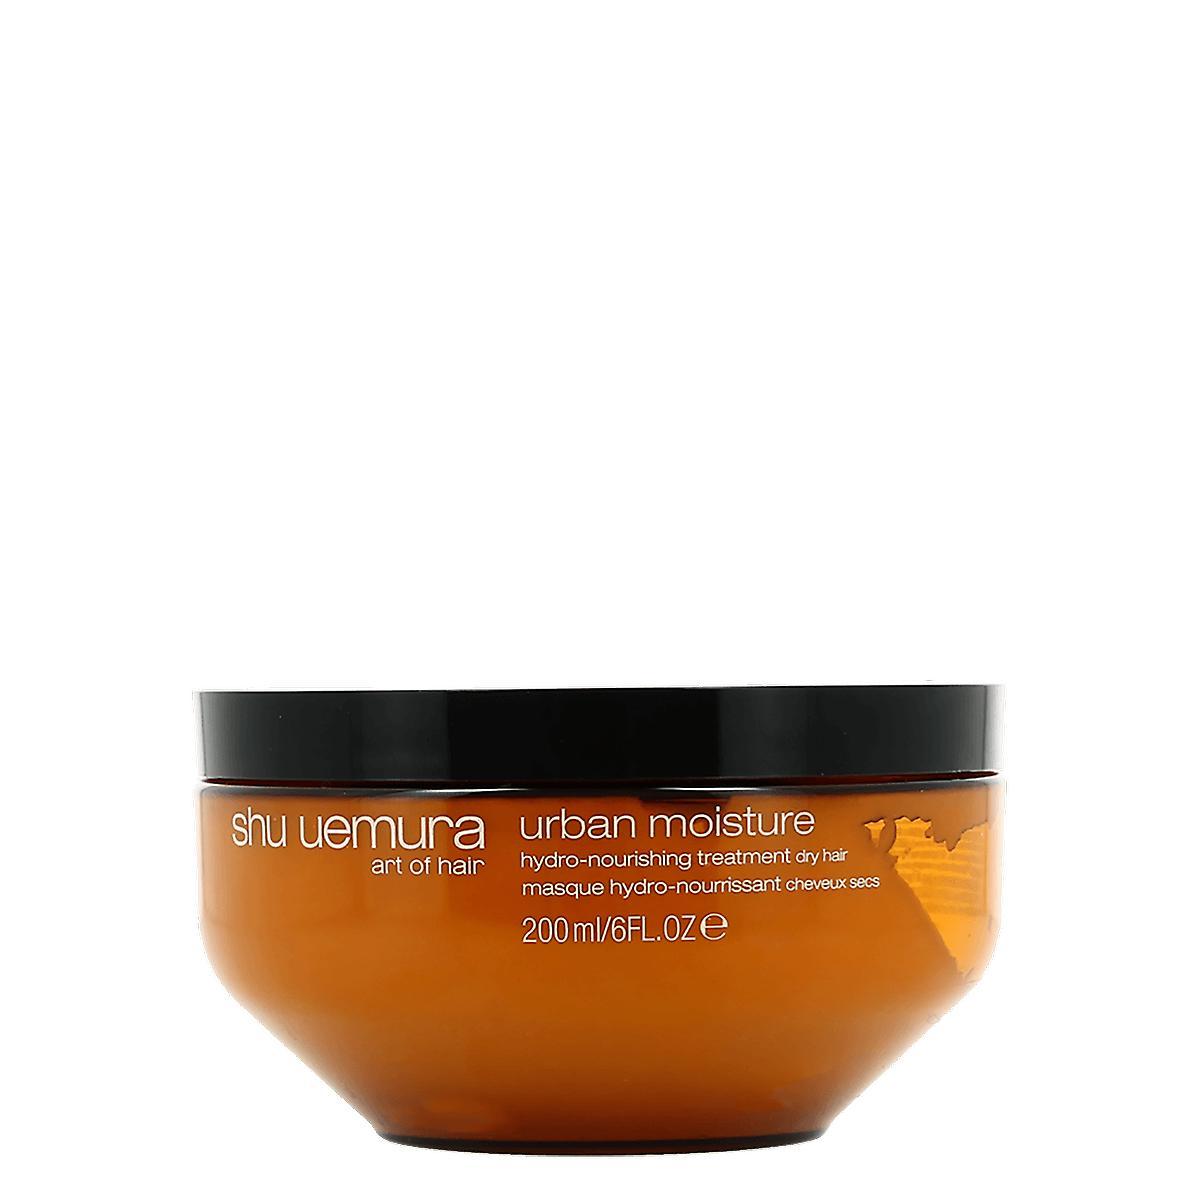 Shu Uemura Urban Moisture Velvet Hydro-Nourishing Masque 200ml